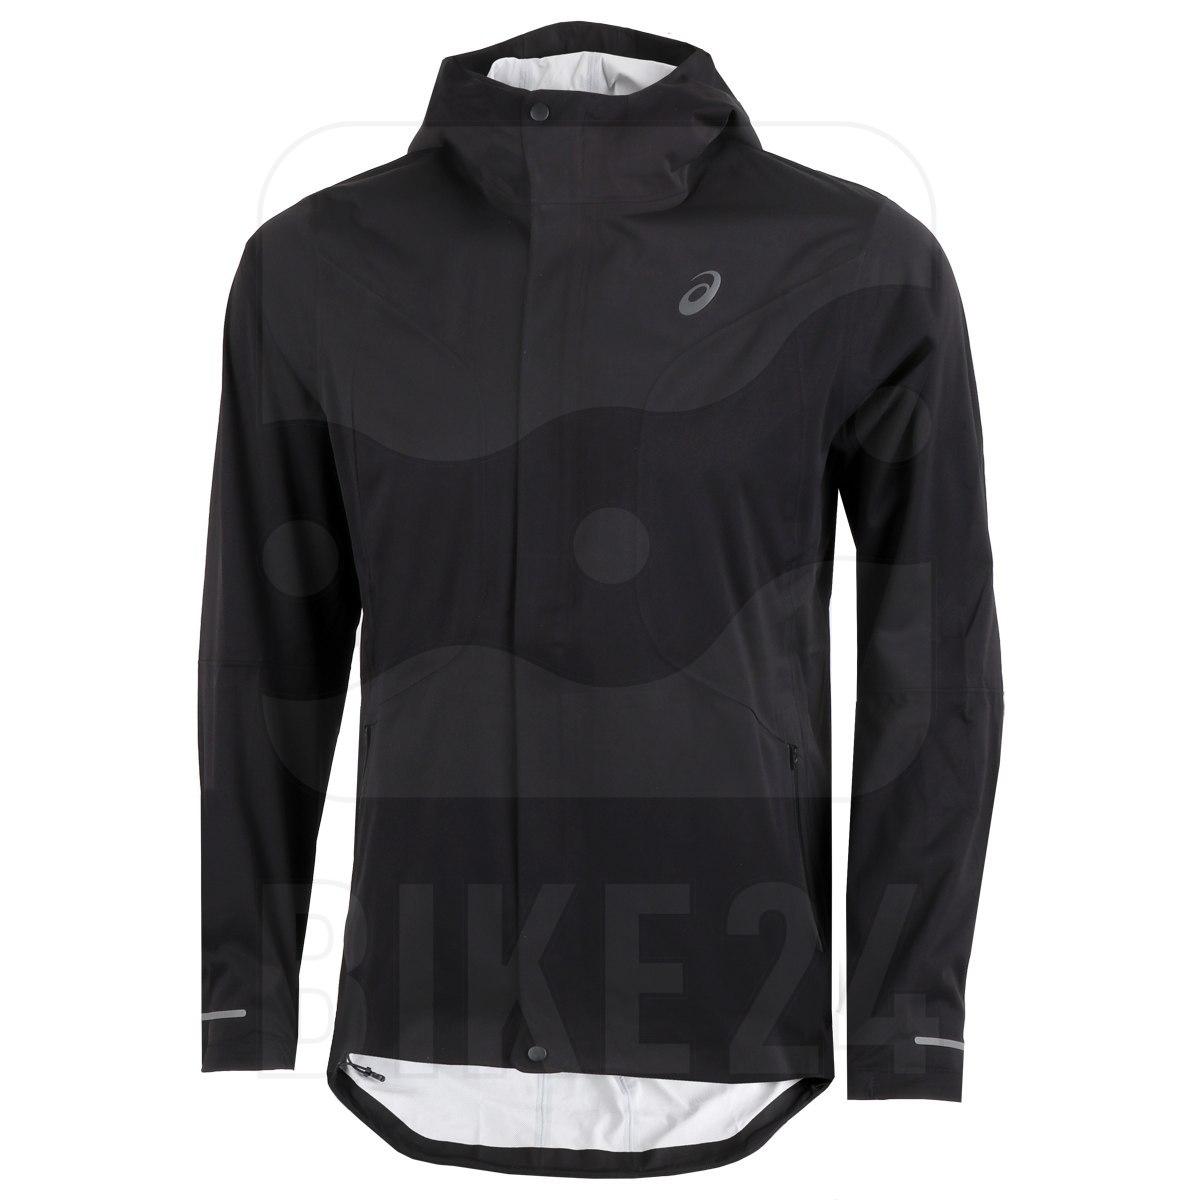 asics Accelerate Running Jacket - performance black